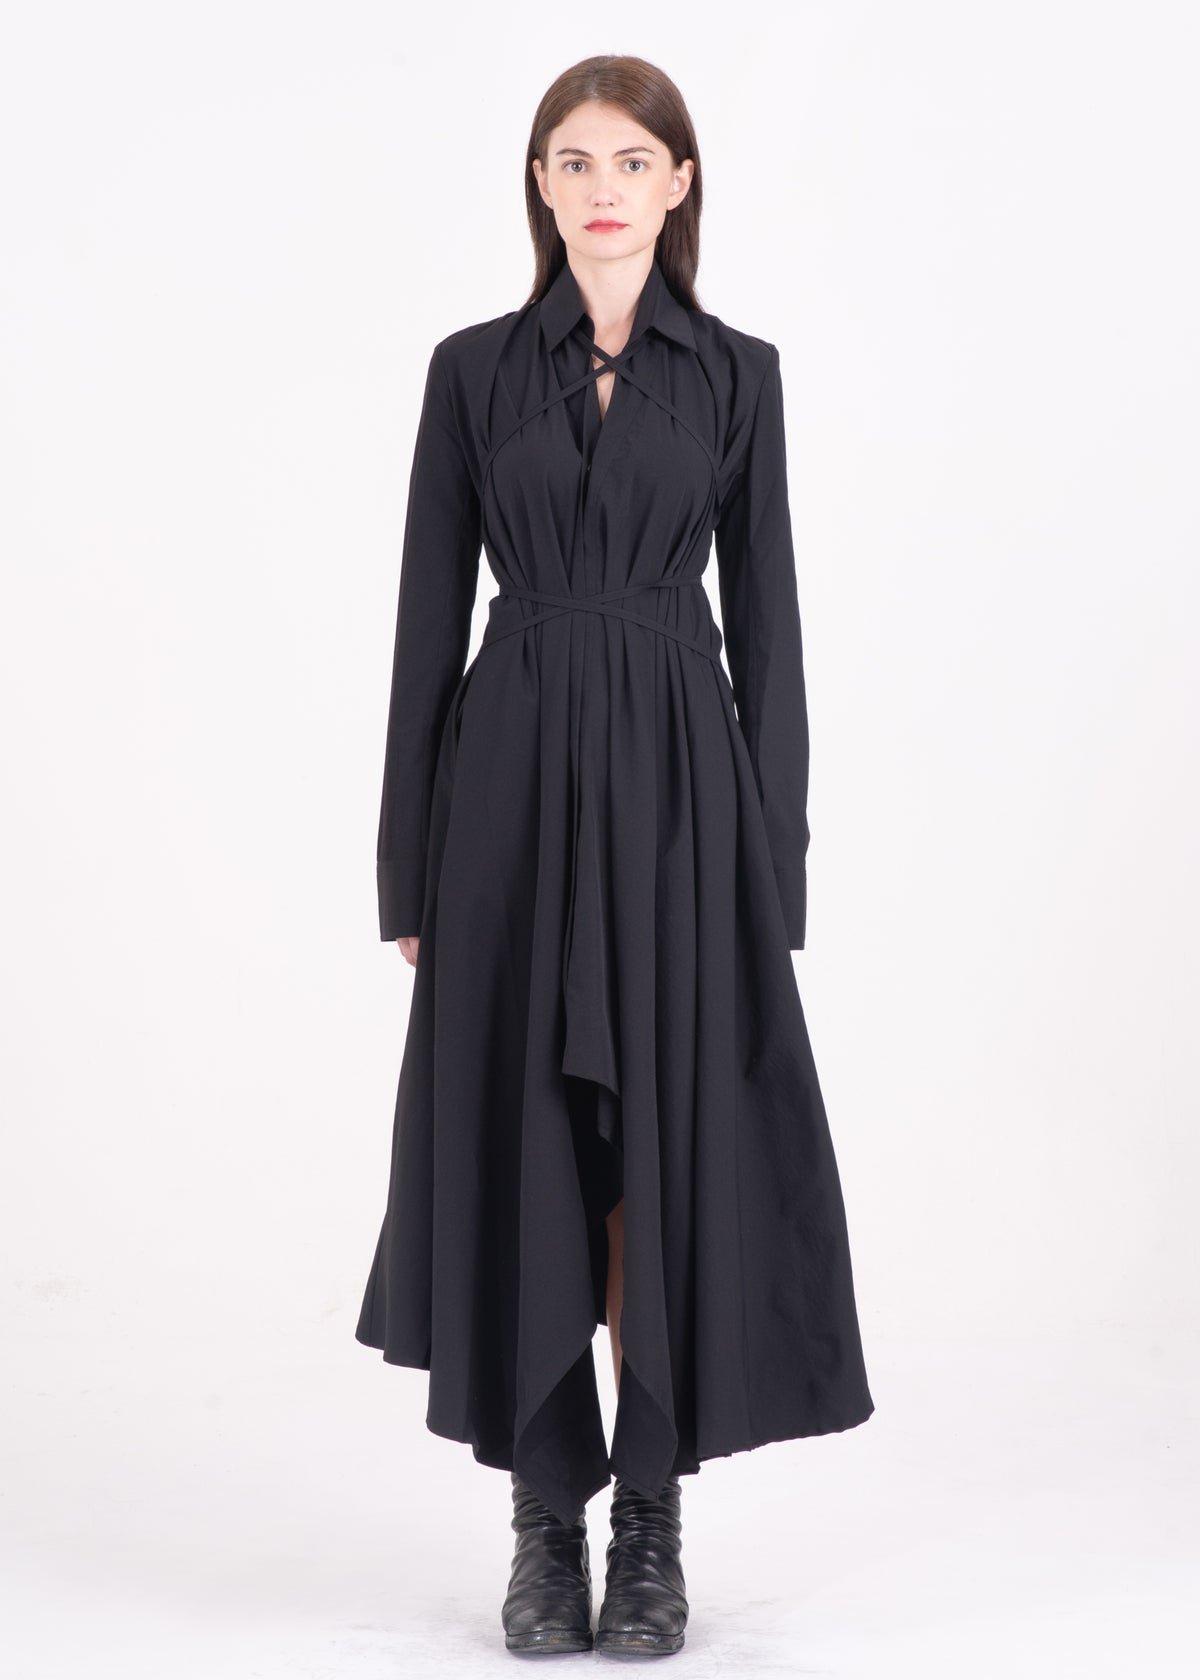 Image of SAMPLE SALE - Multi-Way Asymmetric Lace Up Shirt Dress Black